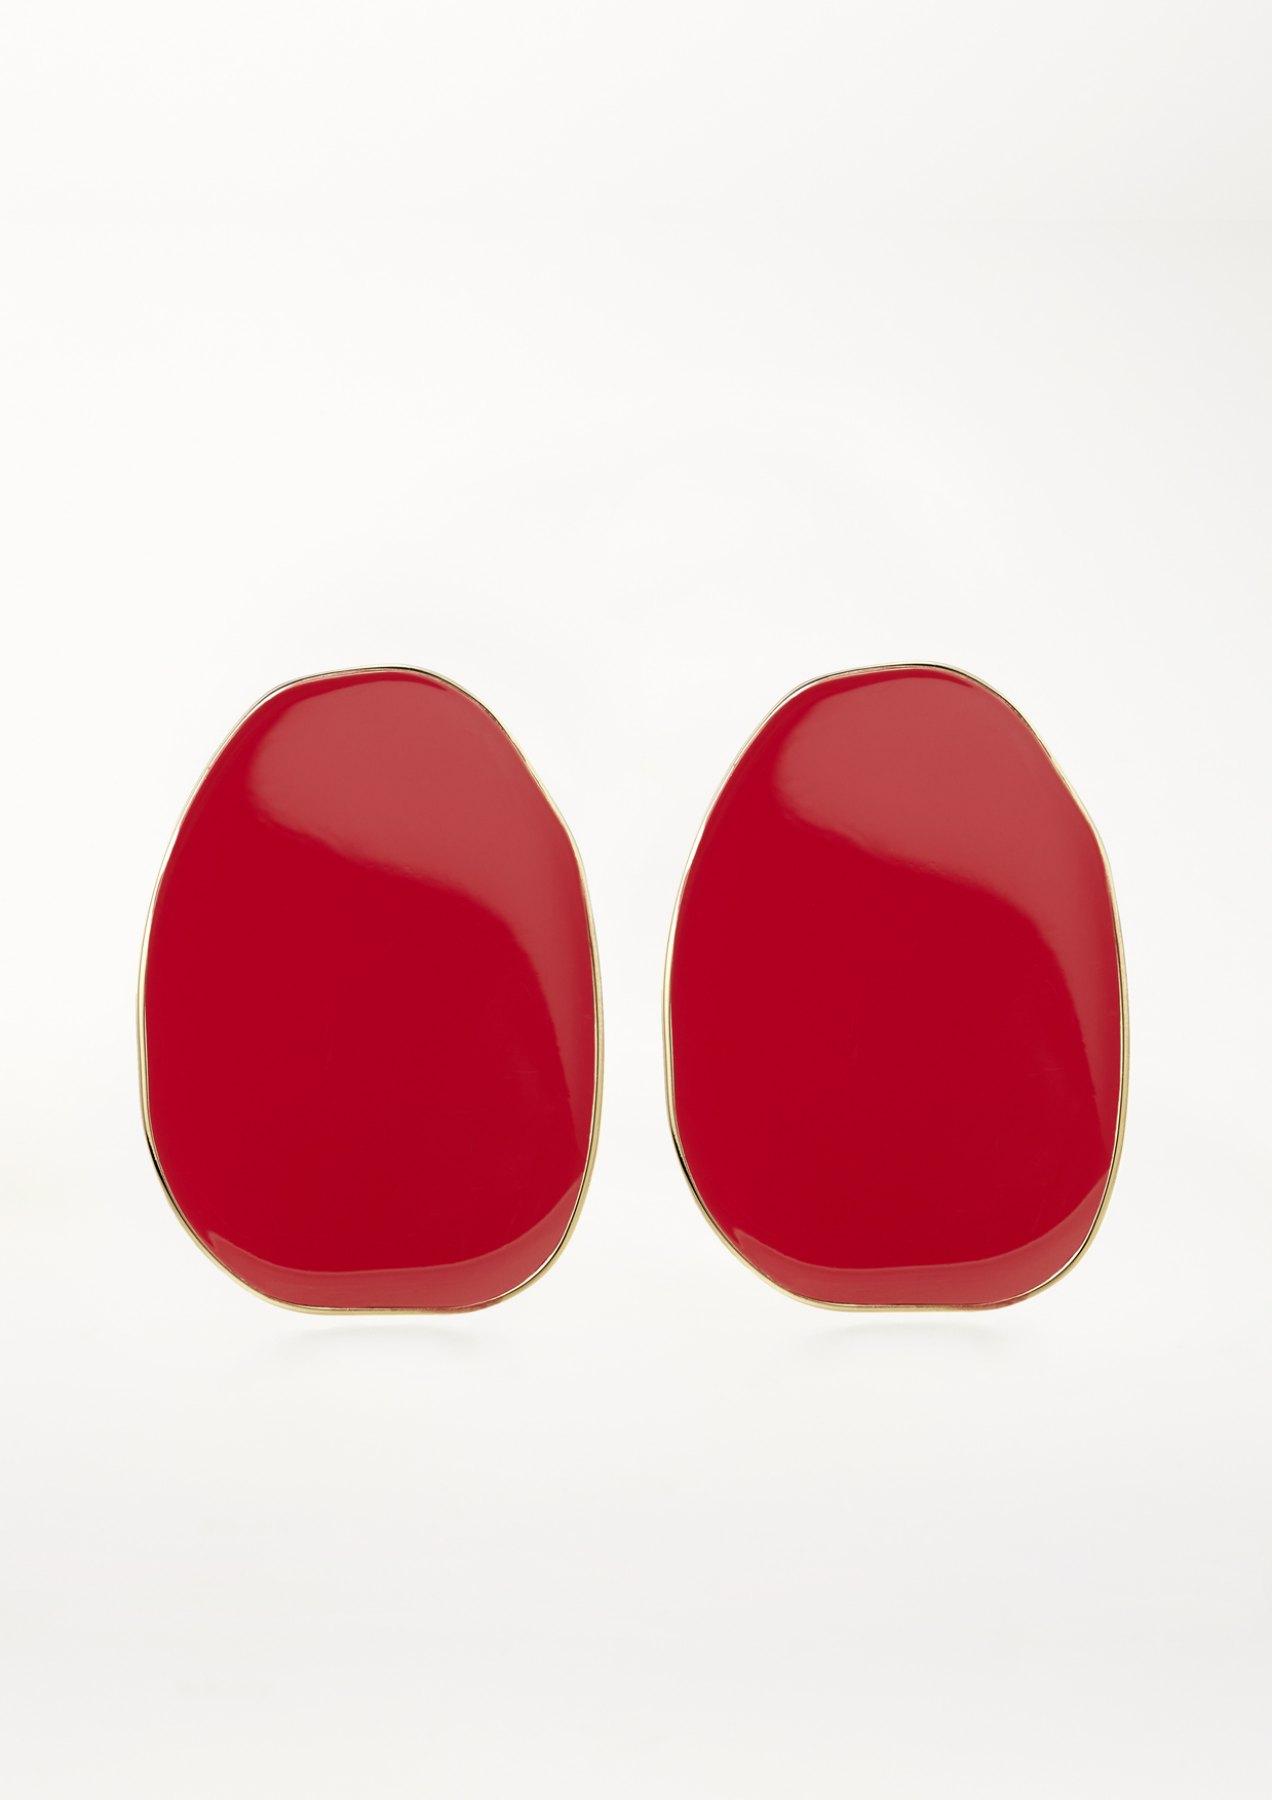 xenia bous jewellery coloured stone 01 earrings feuerrot red